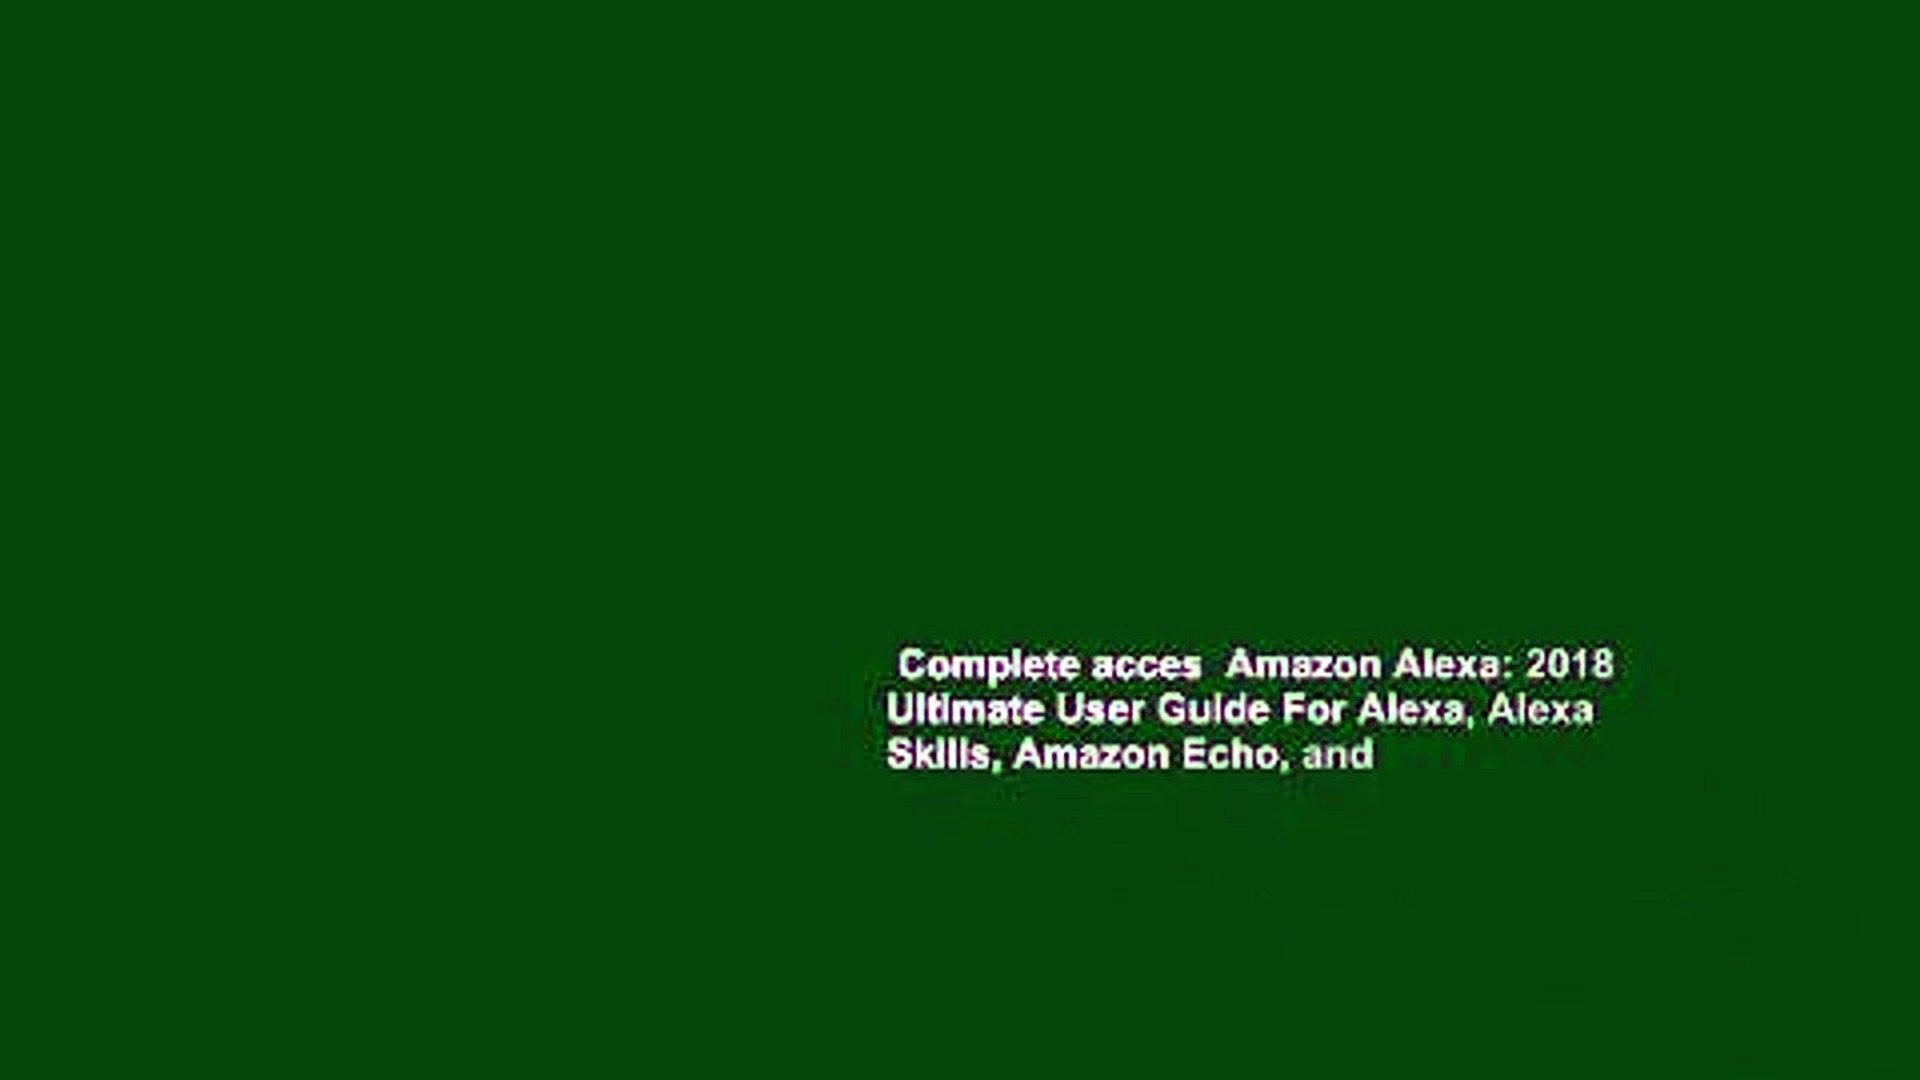 Complete acces  Amazon Alexa: 2018 Ultimate User Guide For Alexa, Alexa Skills, Amazon Echo, and